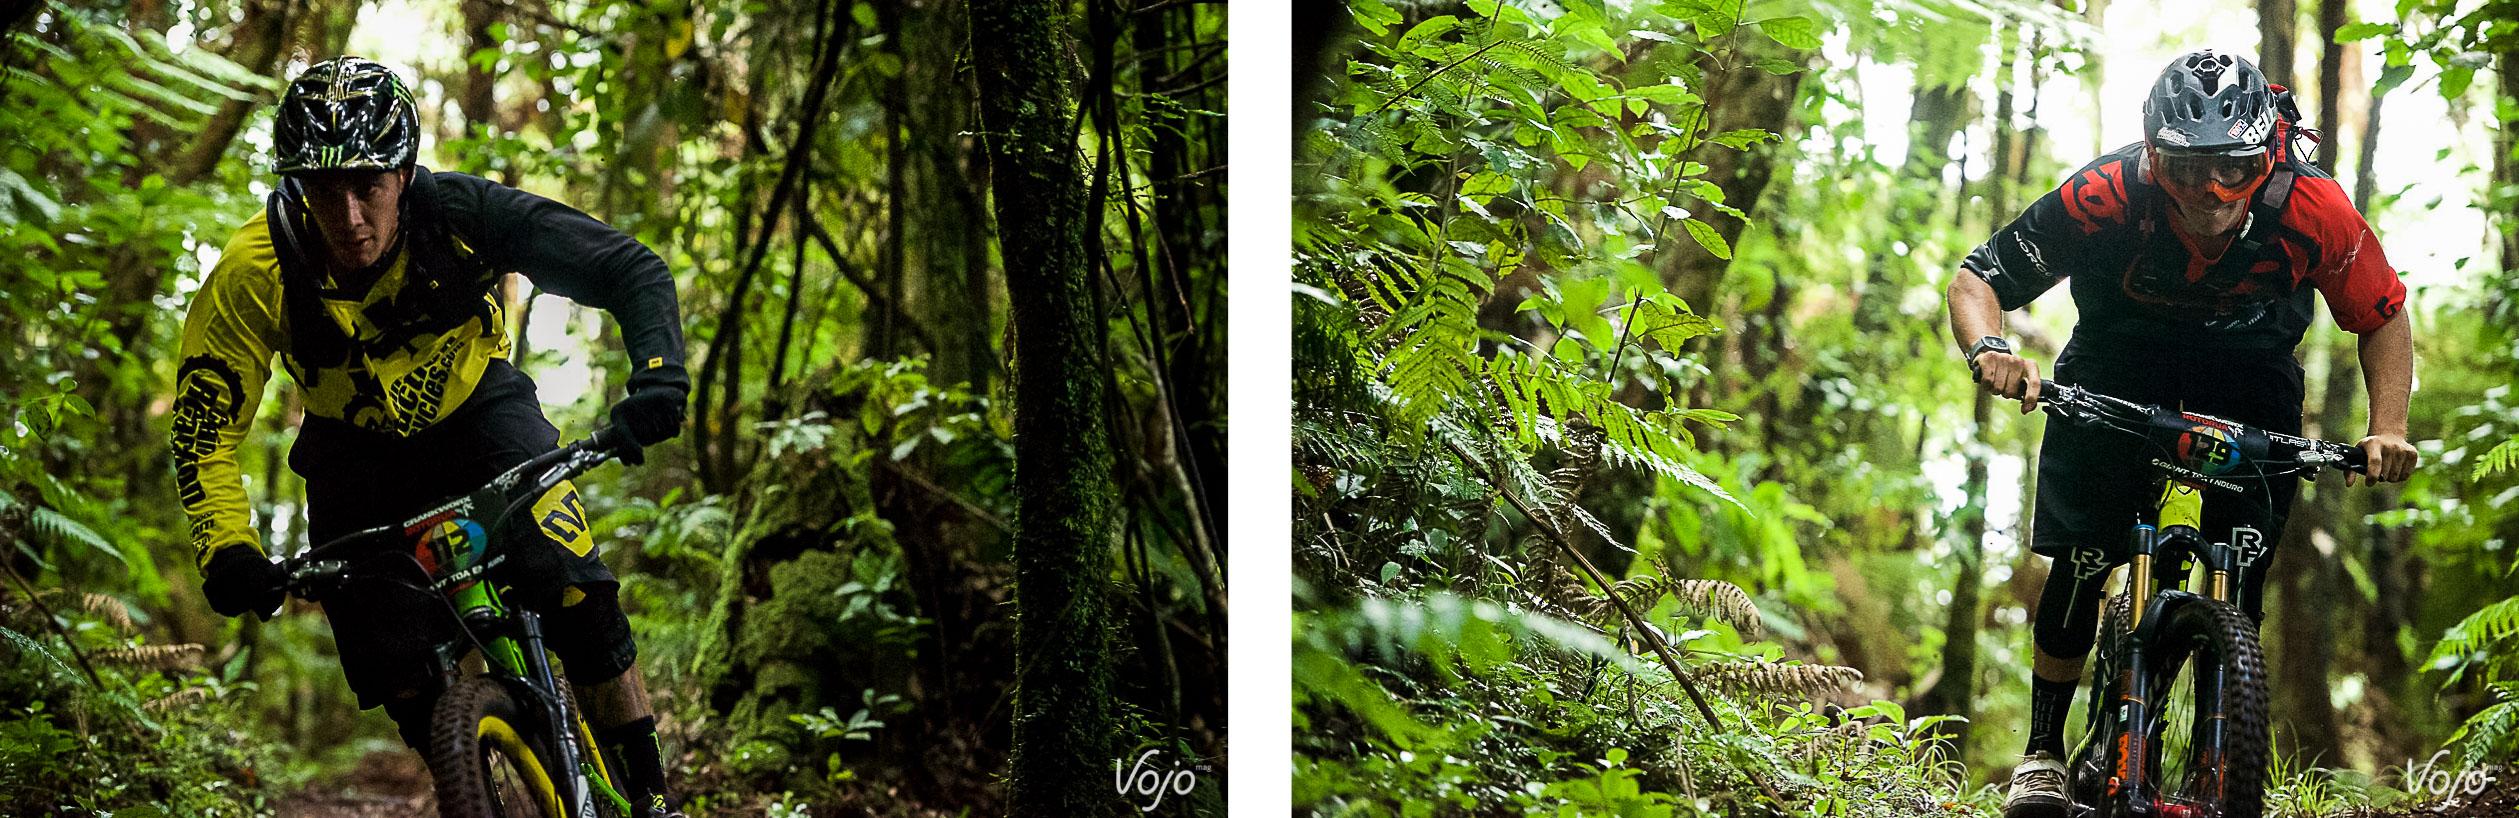 Compo2_Enduro_World_Series_Rotorua_Copyright_Simone_Lanciotti_MTBCult_VojoMag-1